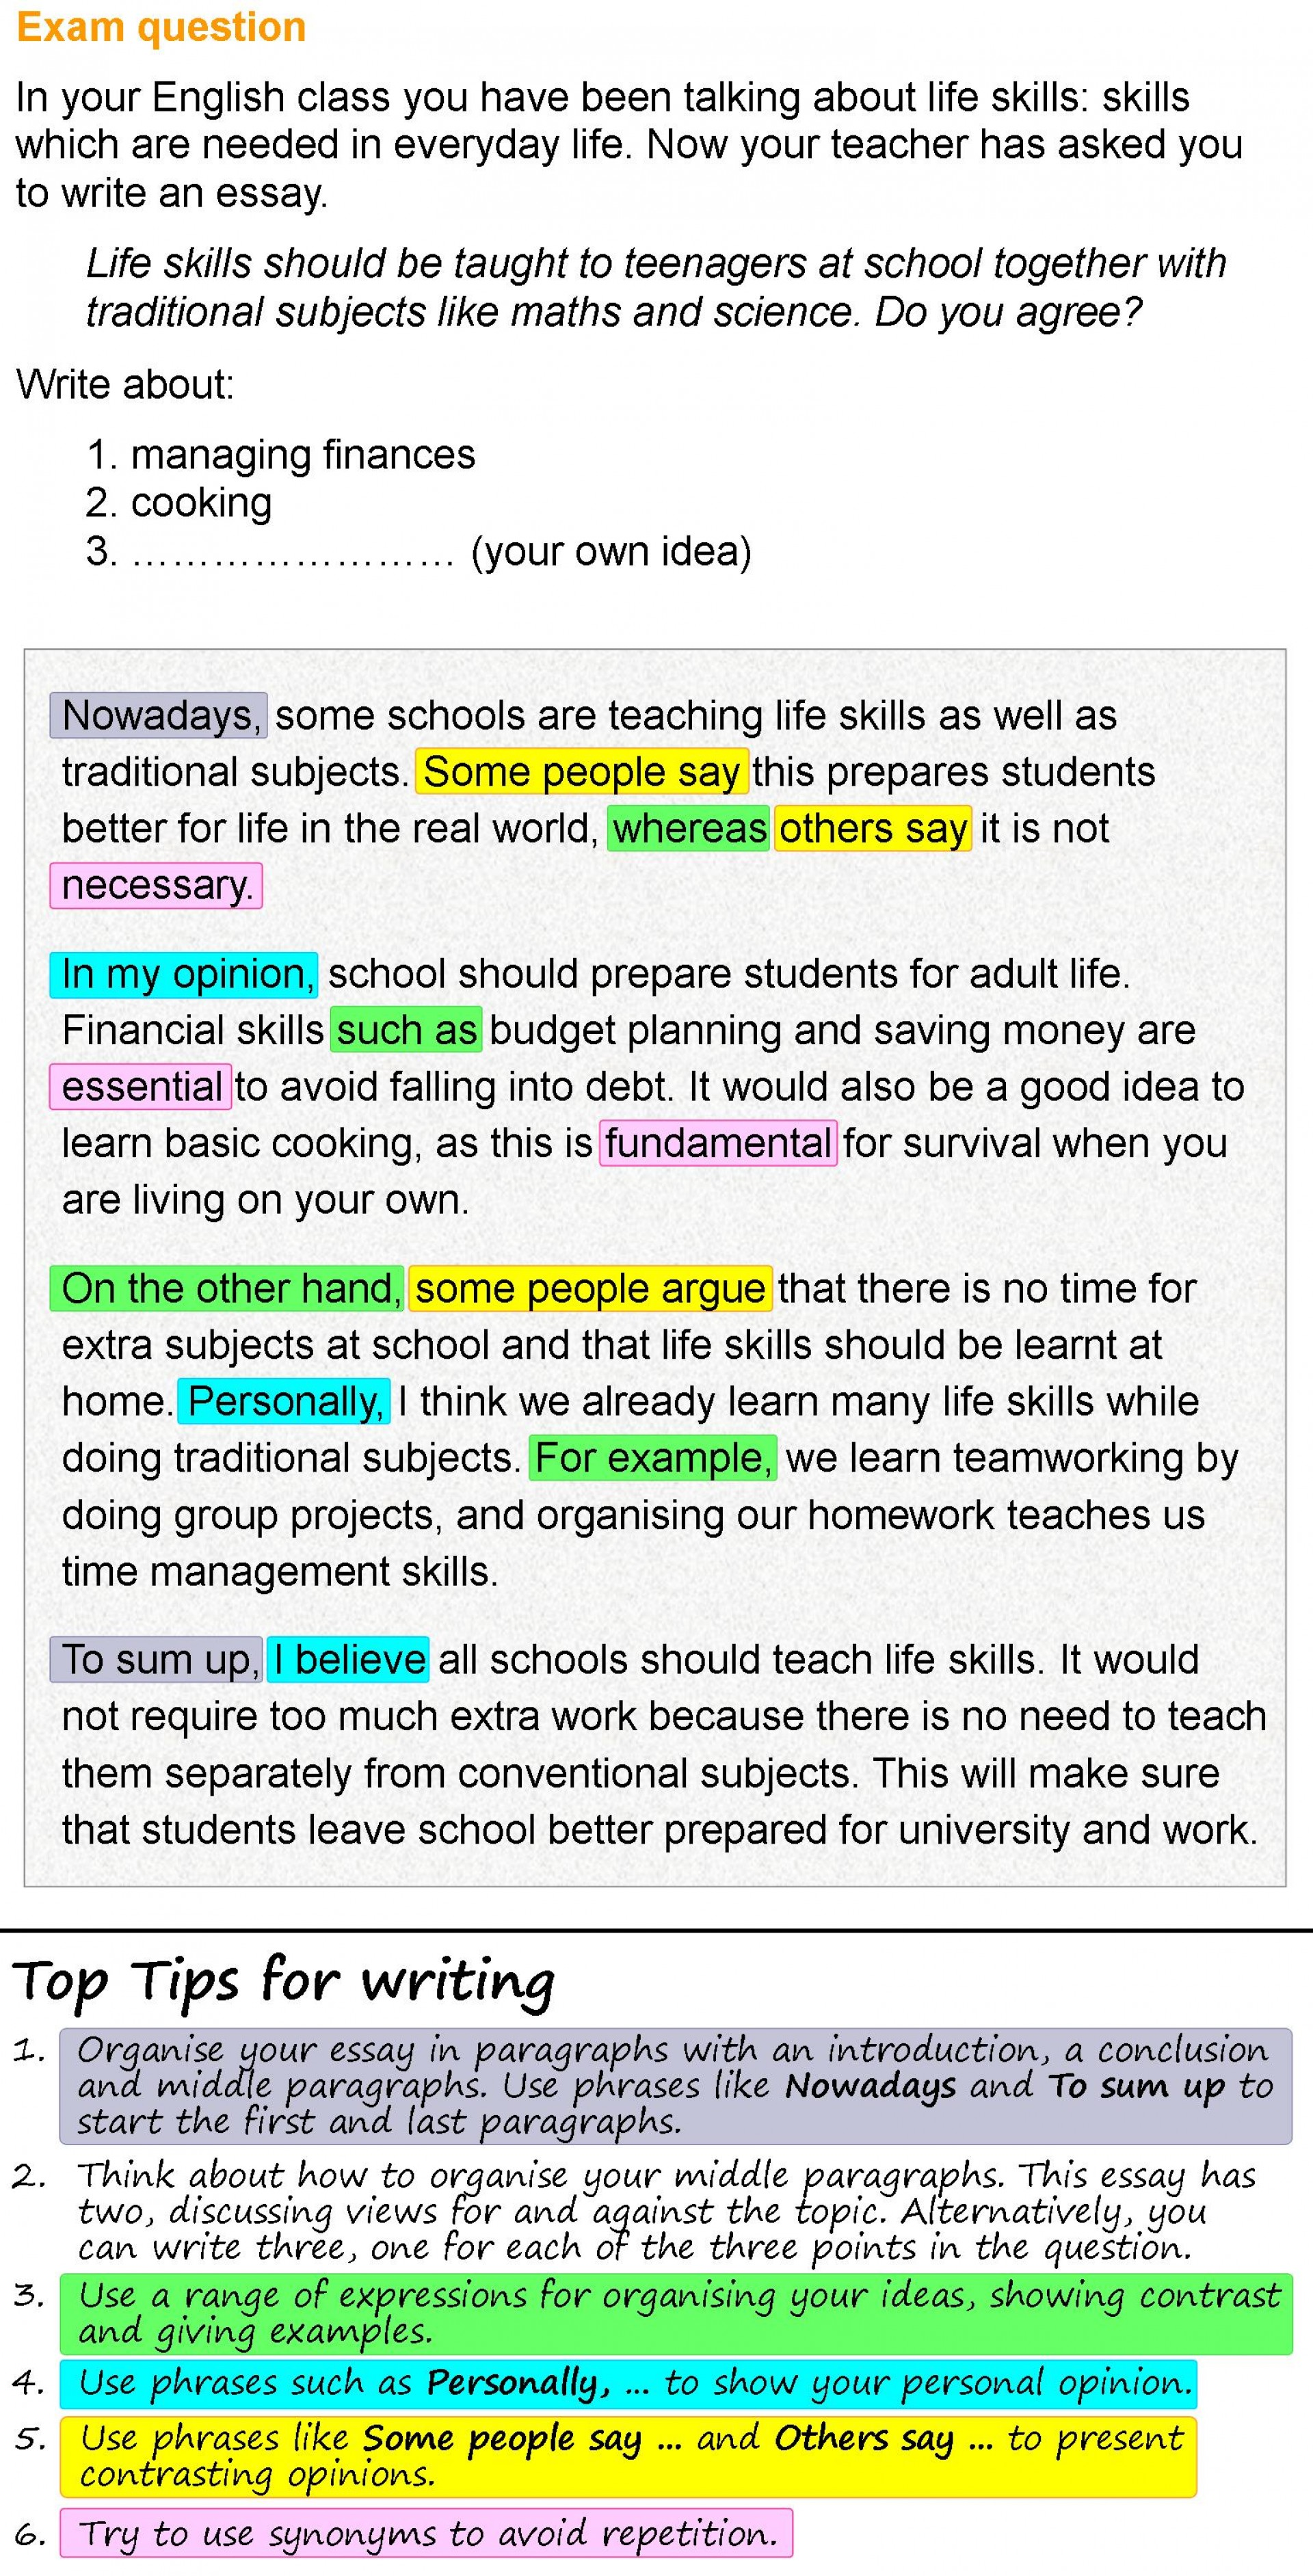 006 Essay Writing On Examination Day Life Skills 1 Rare 1920